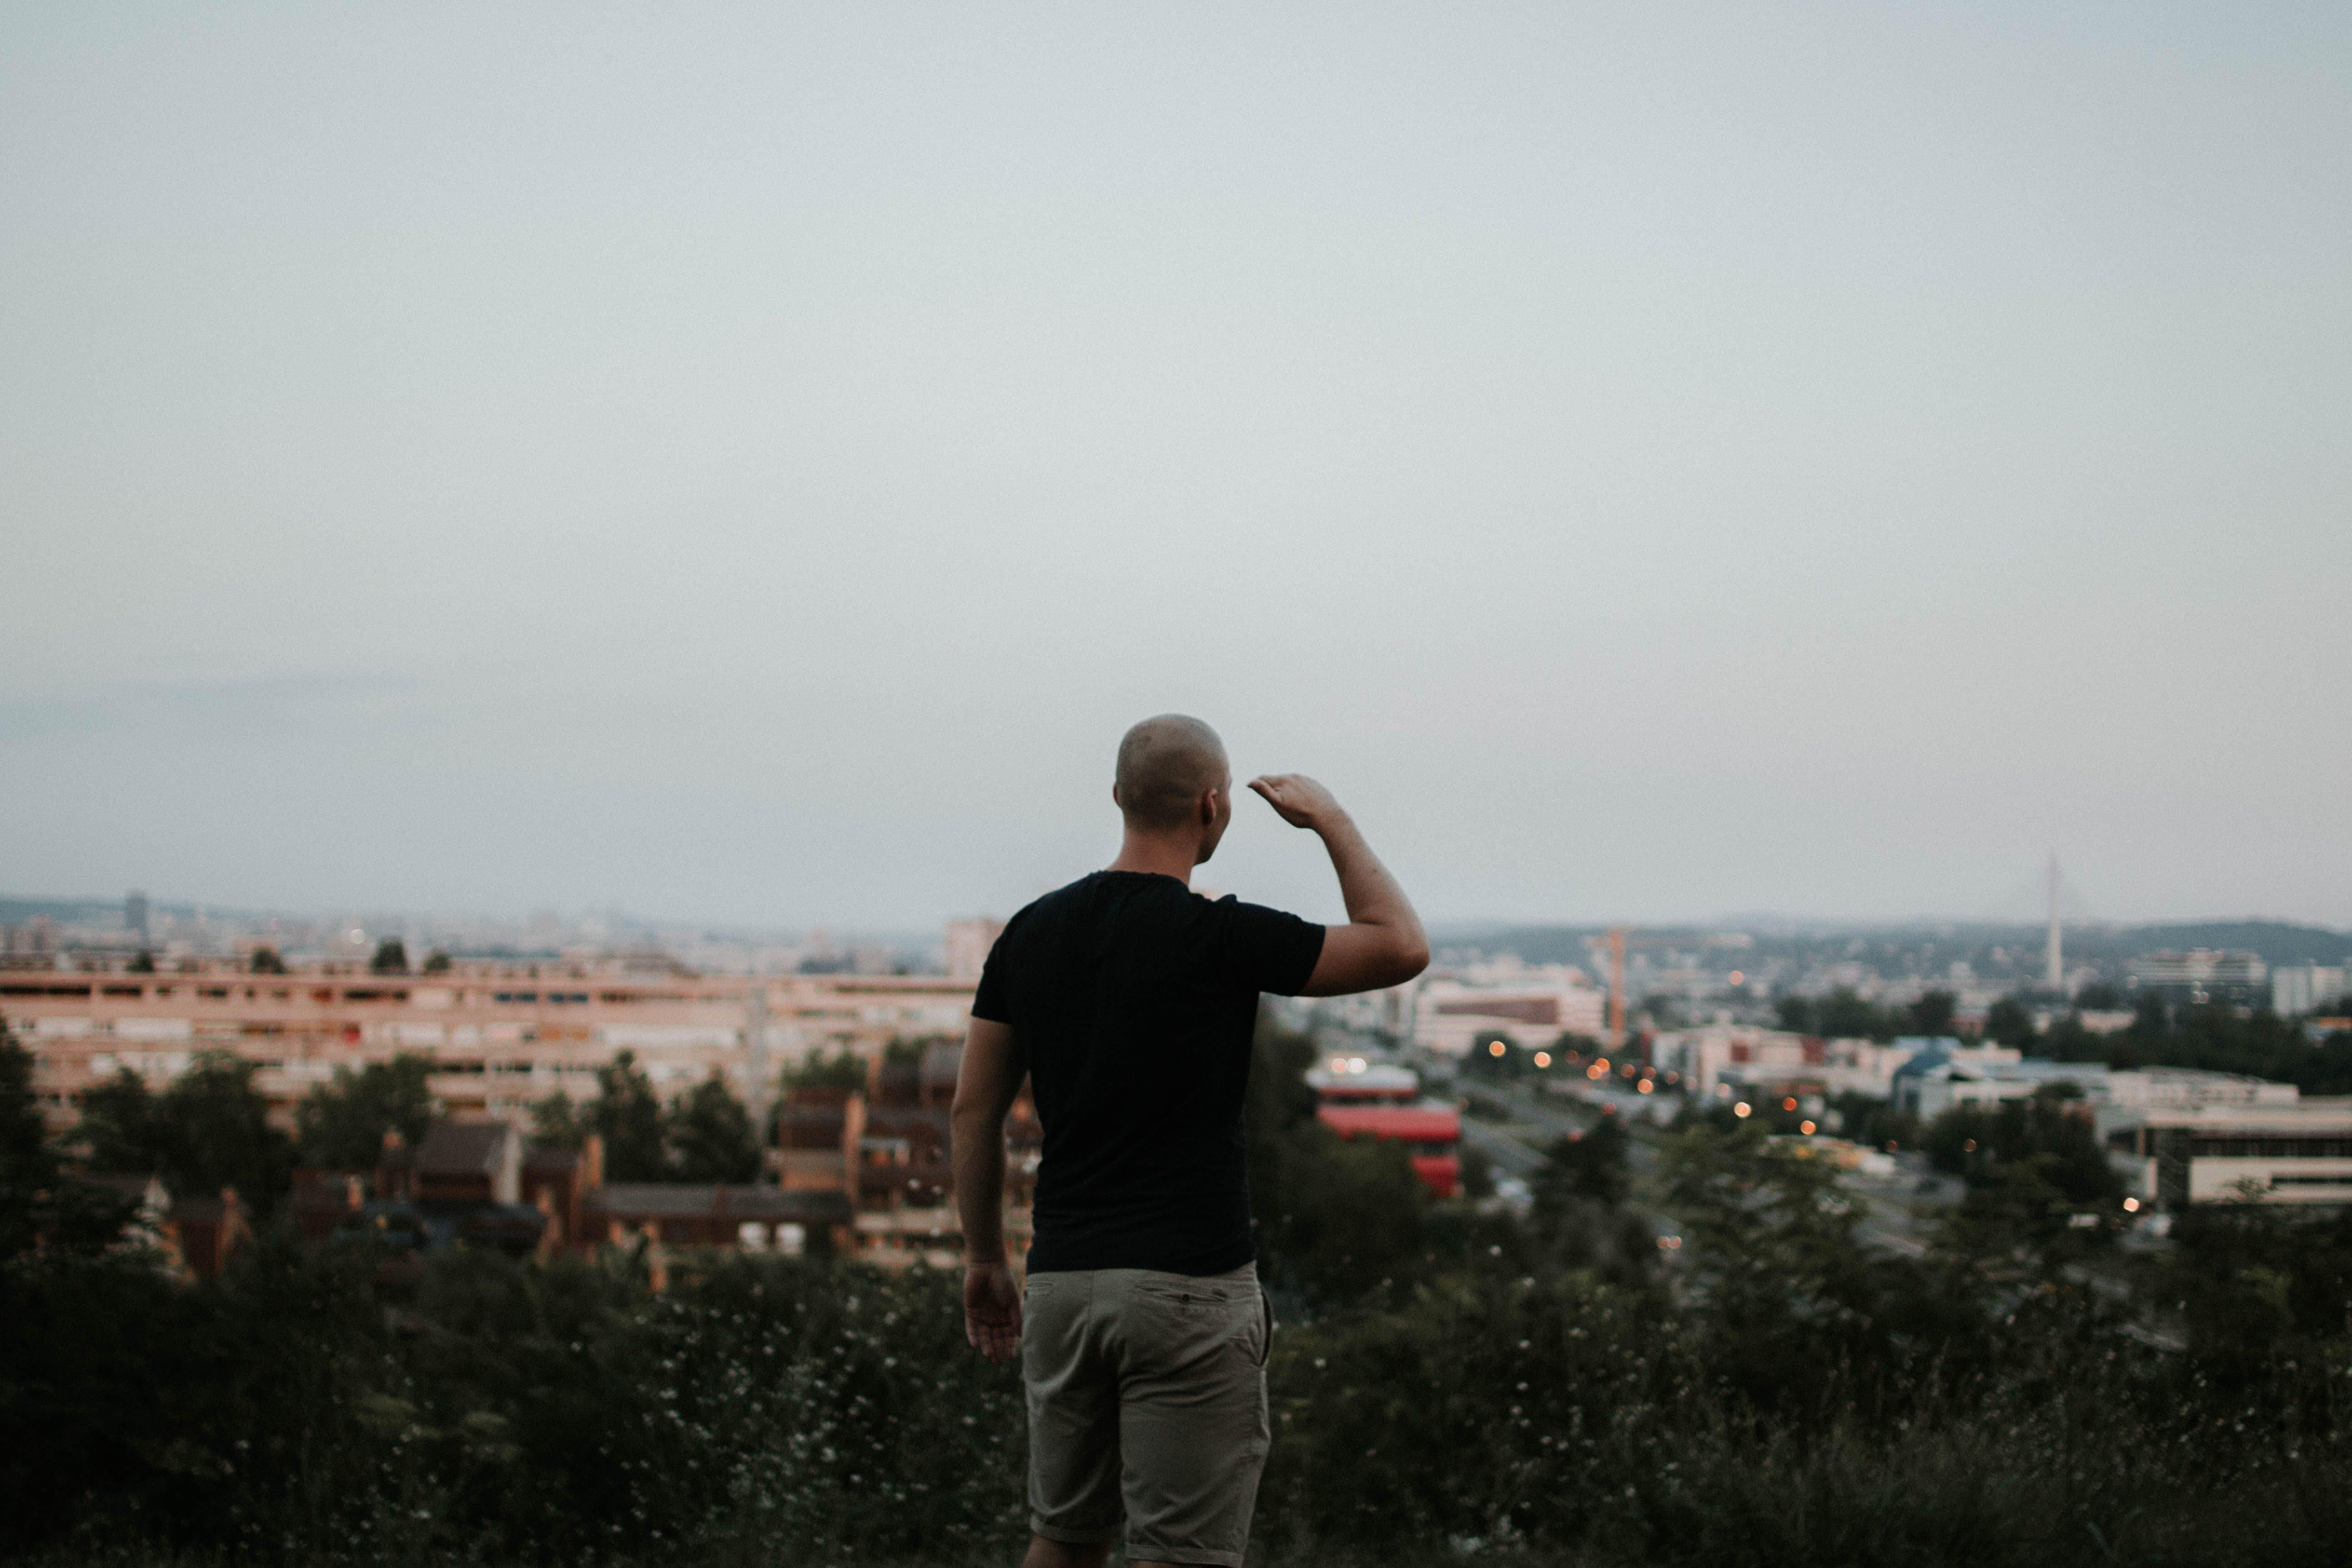 Man Looking Towards the City